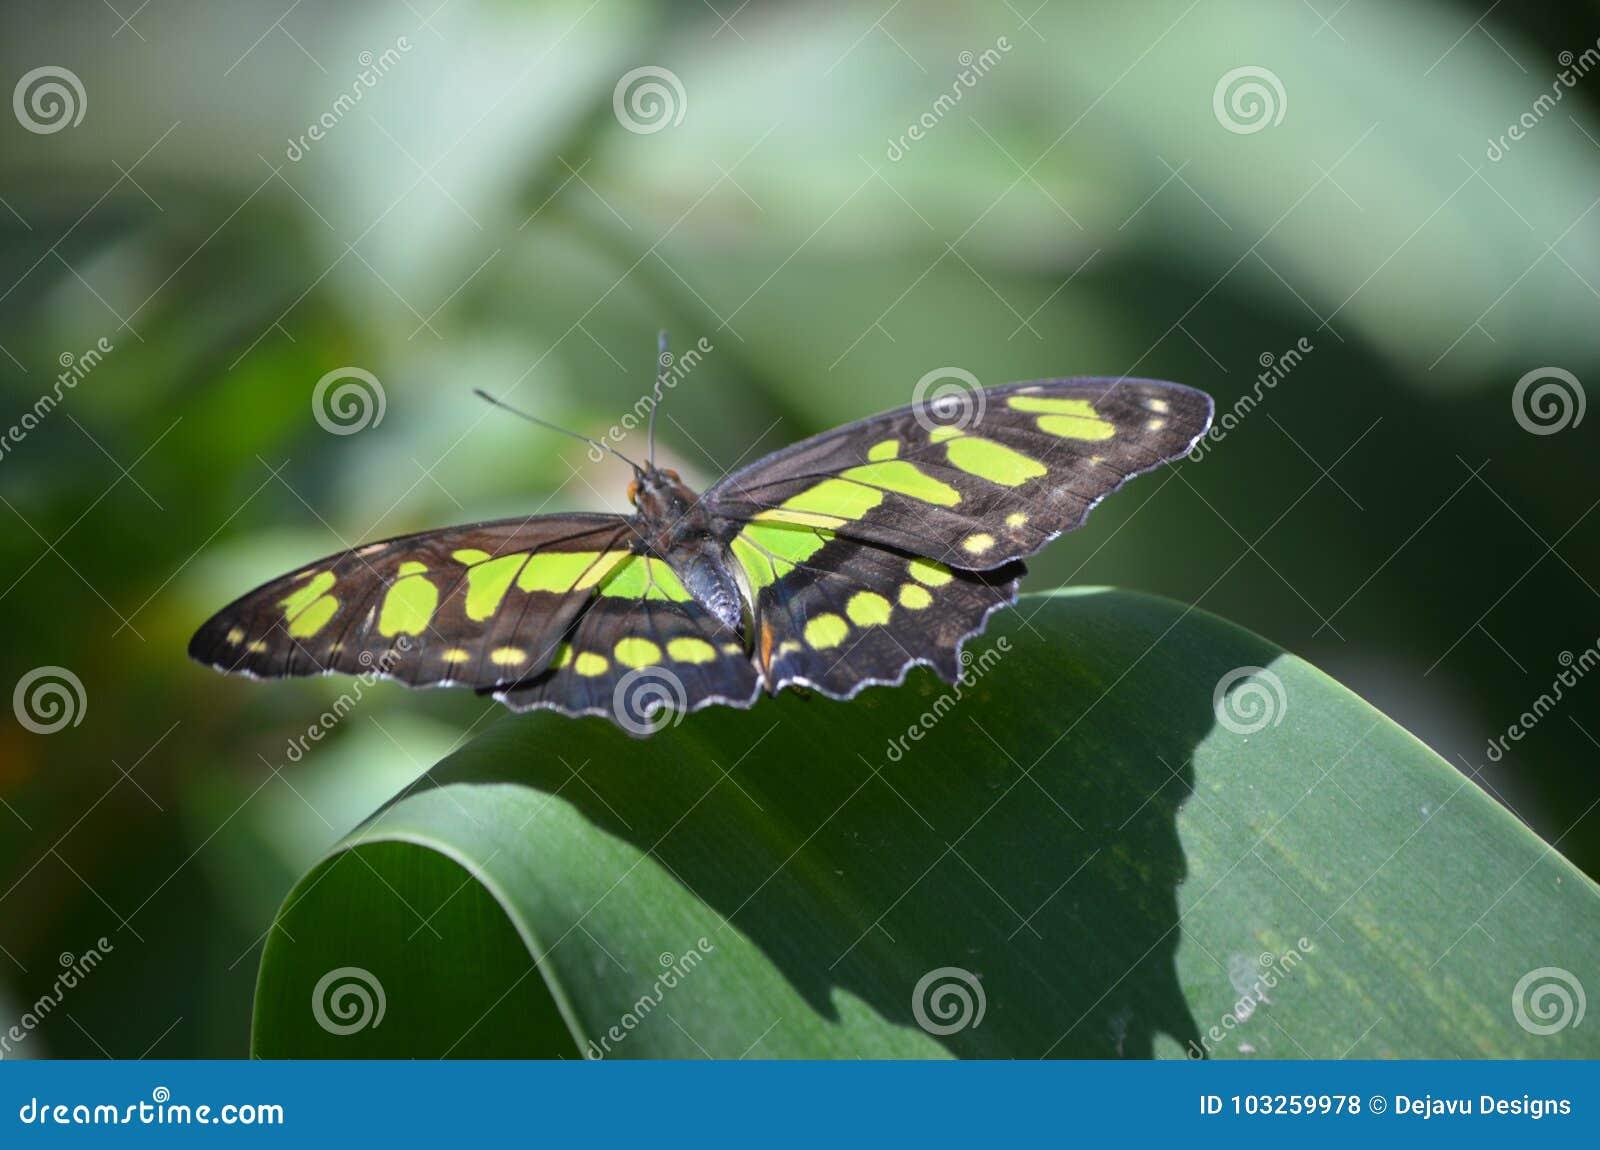 Beautiful Black and Green Malachite Butterfly Up Close